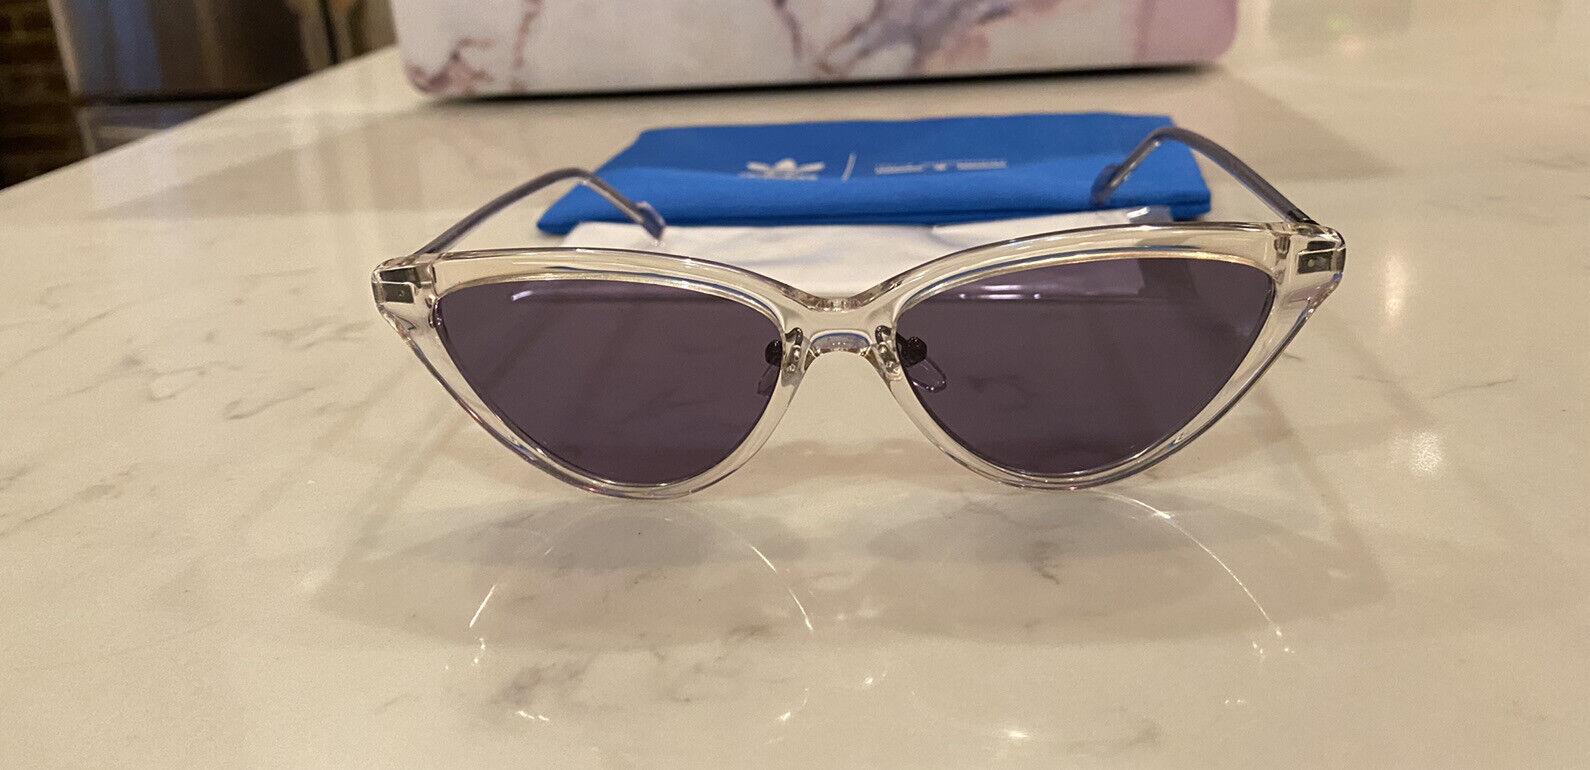 BRAND NEW AUTHENTIC Adidas cateye Sunglasses